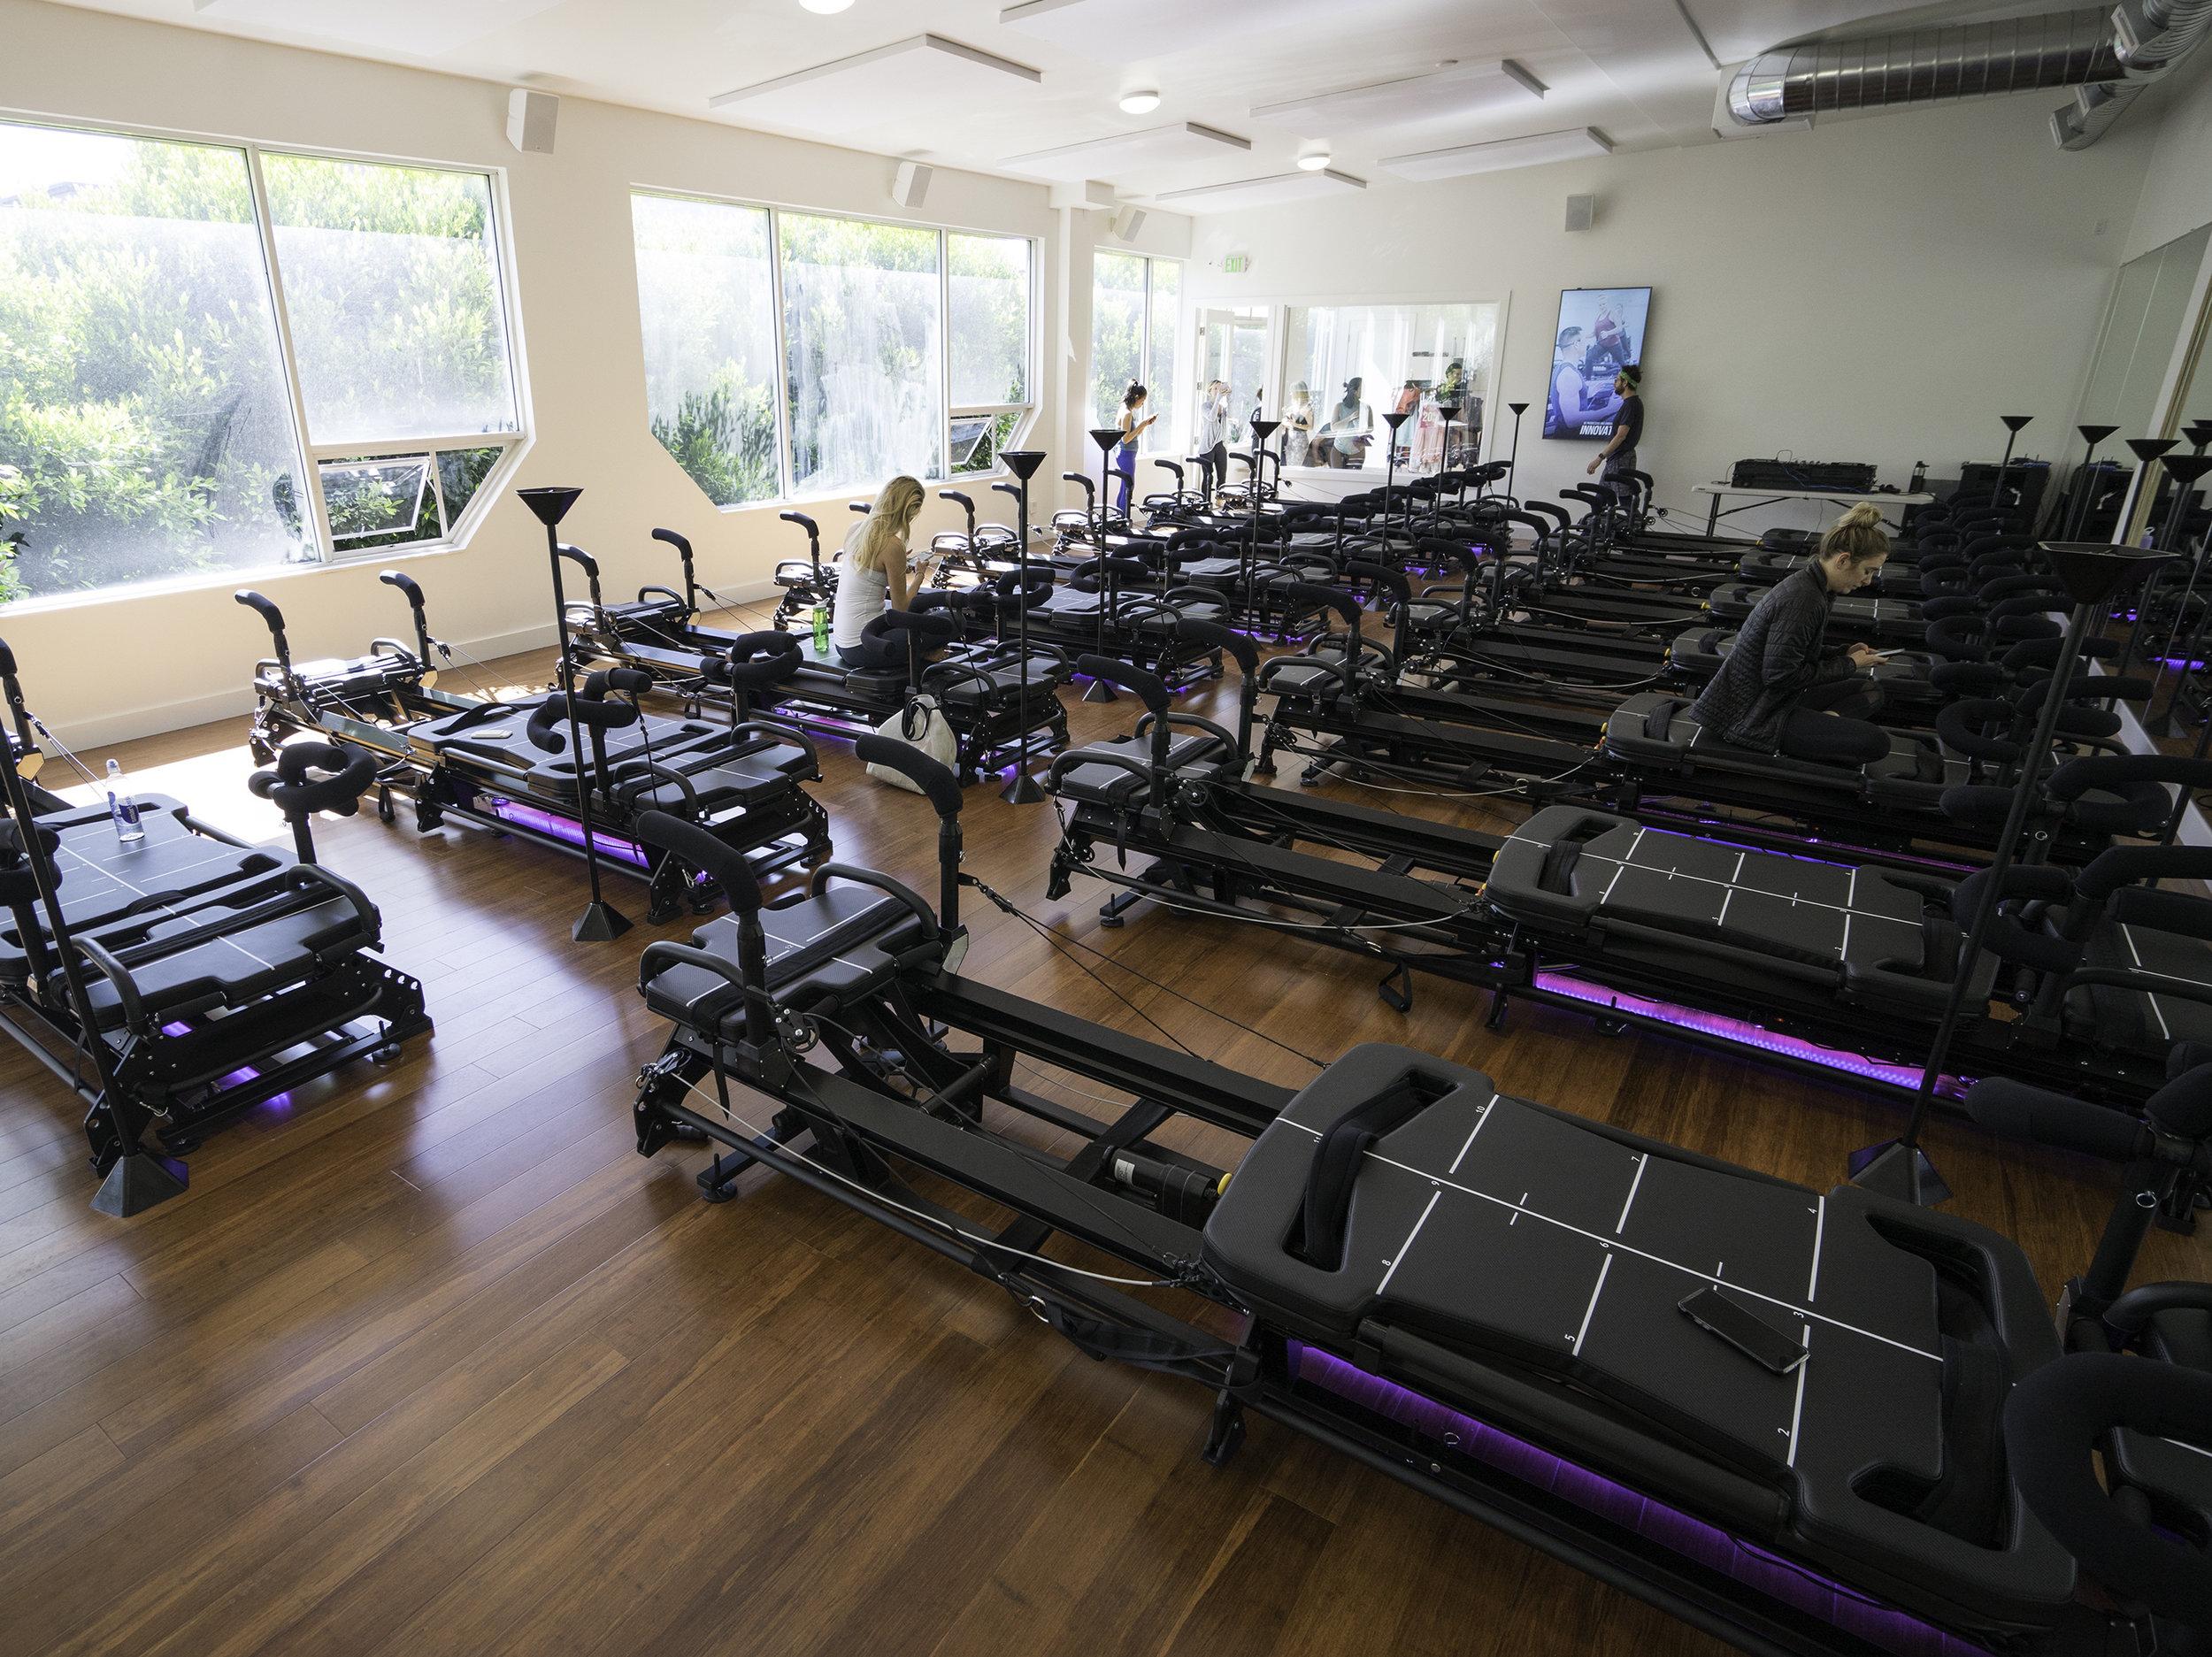 Core 40 Fitness Studio - Marina, San Francisco